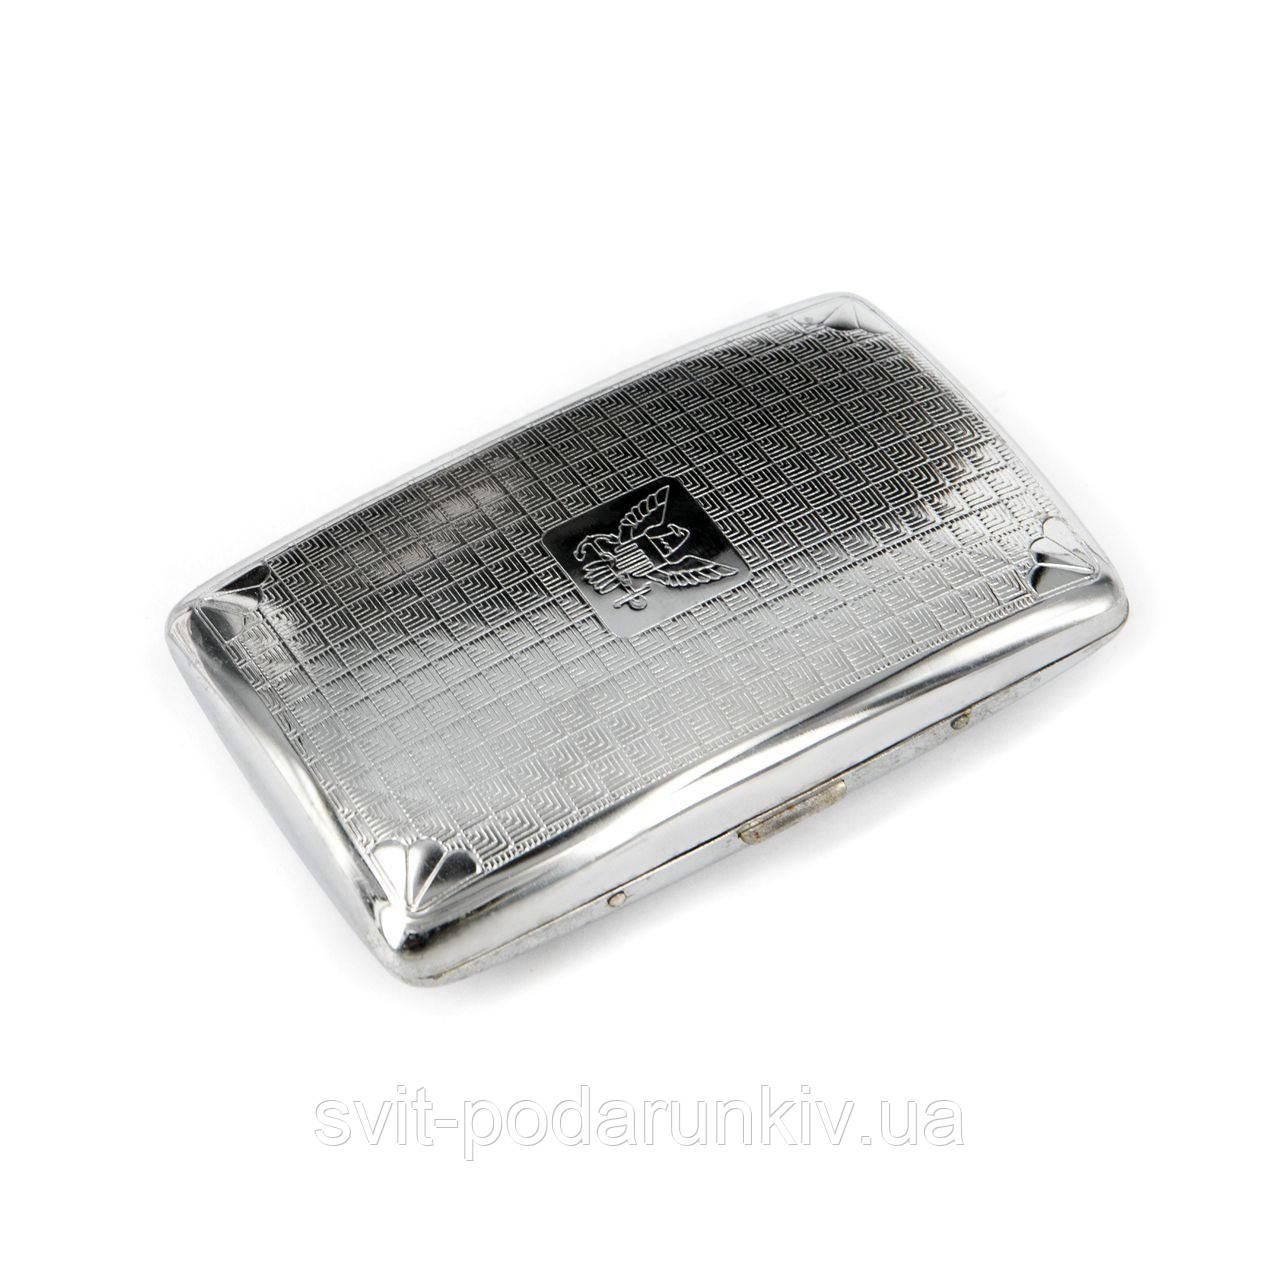 Портсигар 200021 металлический